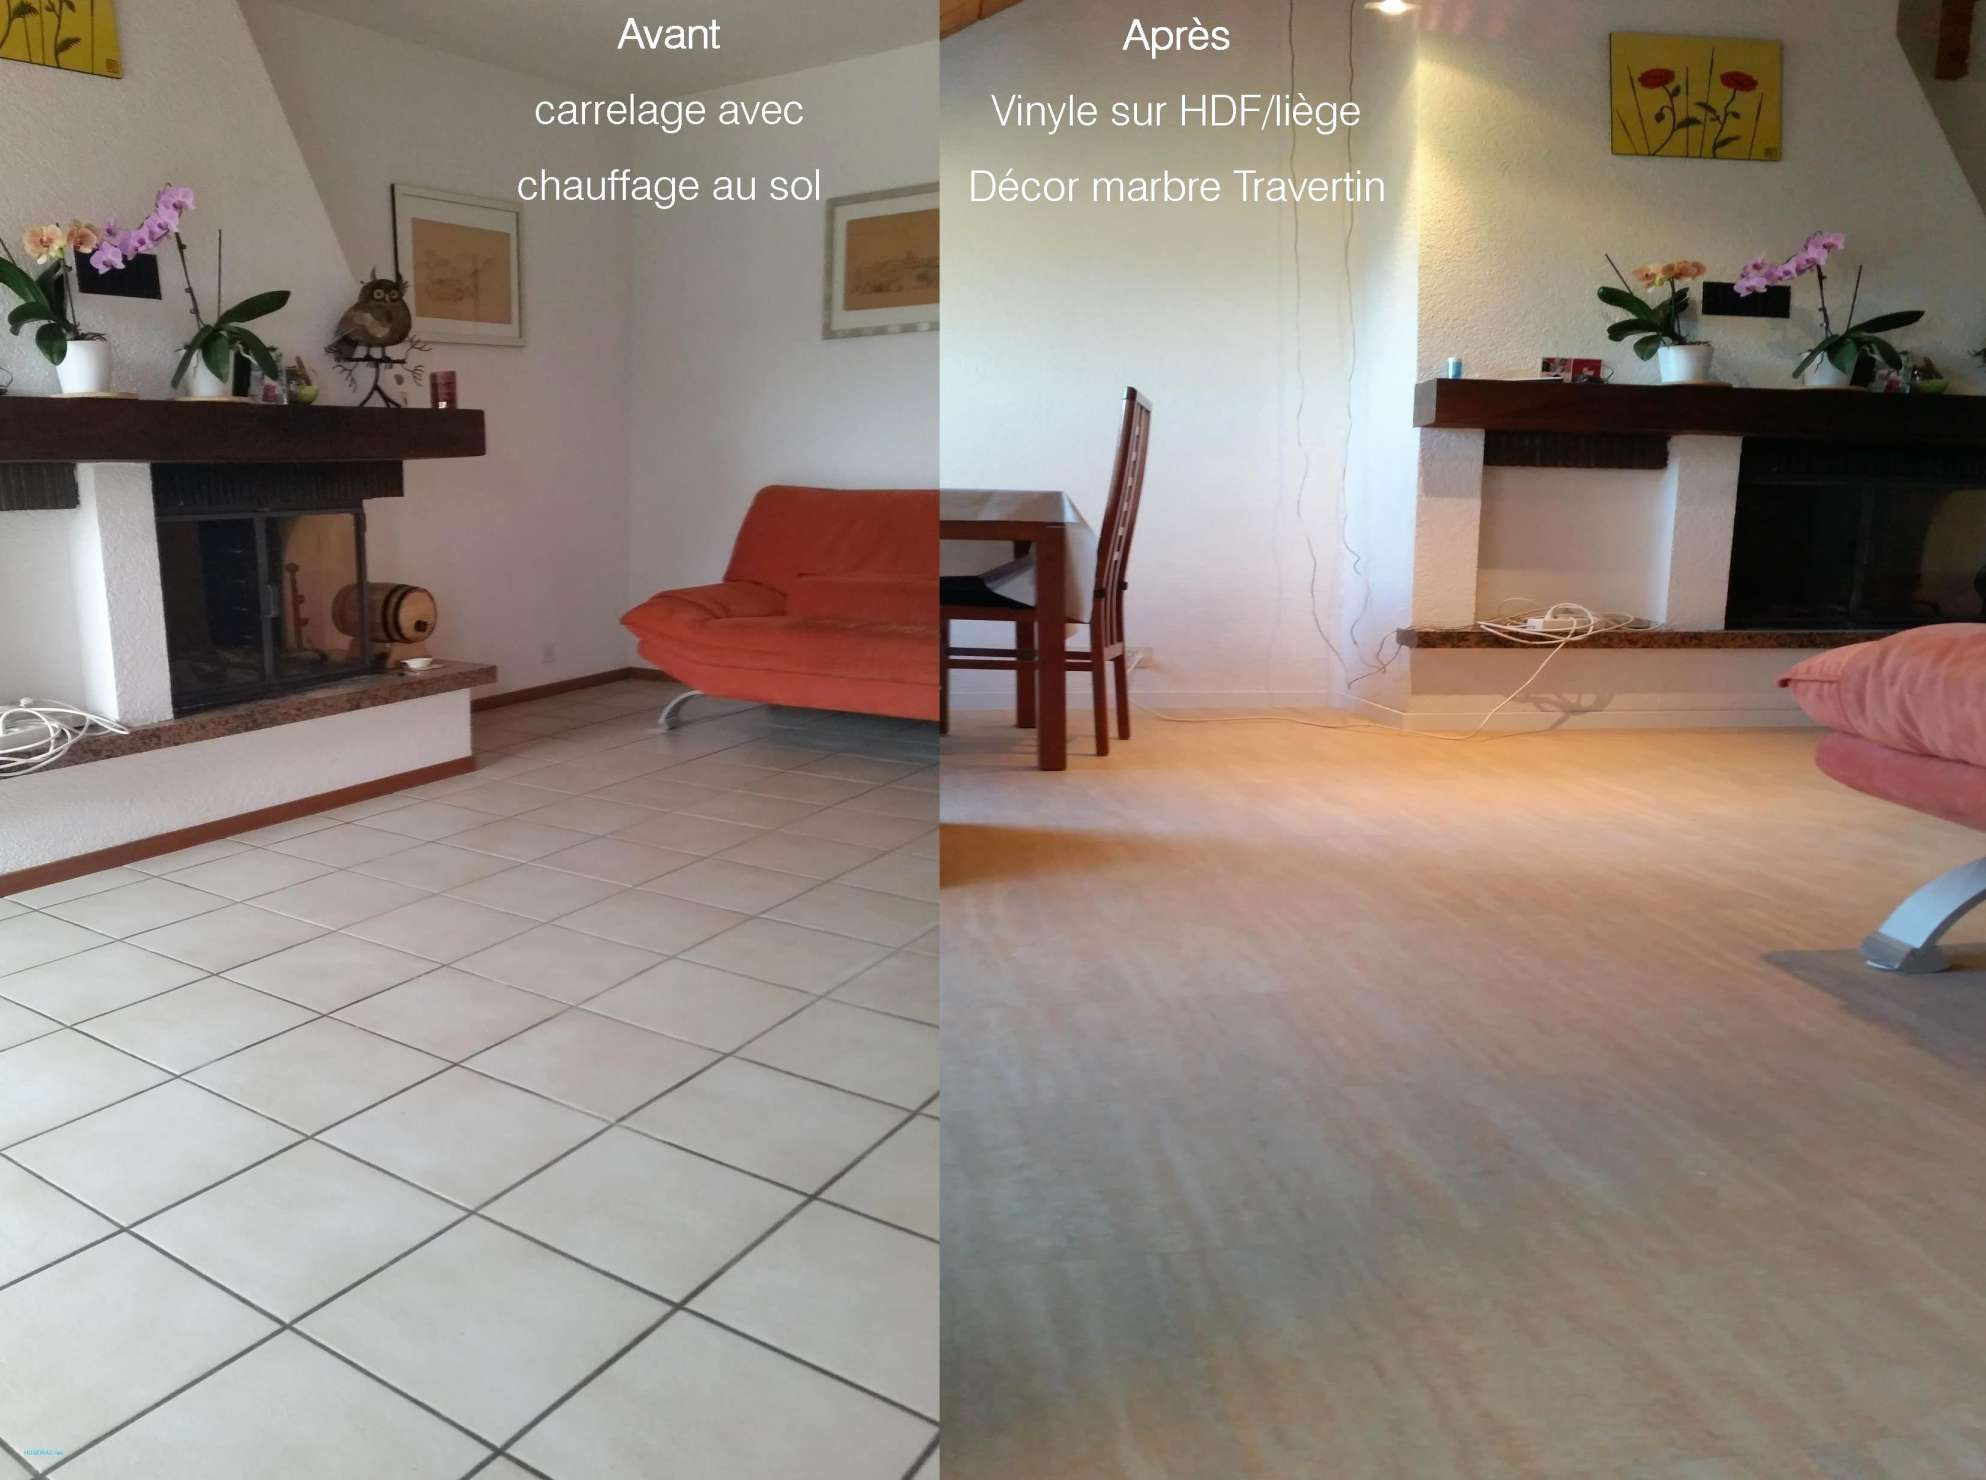 16 Recouvrir Carrelage Sol Chauffant Flooring House Design Design